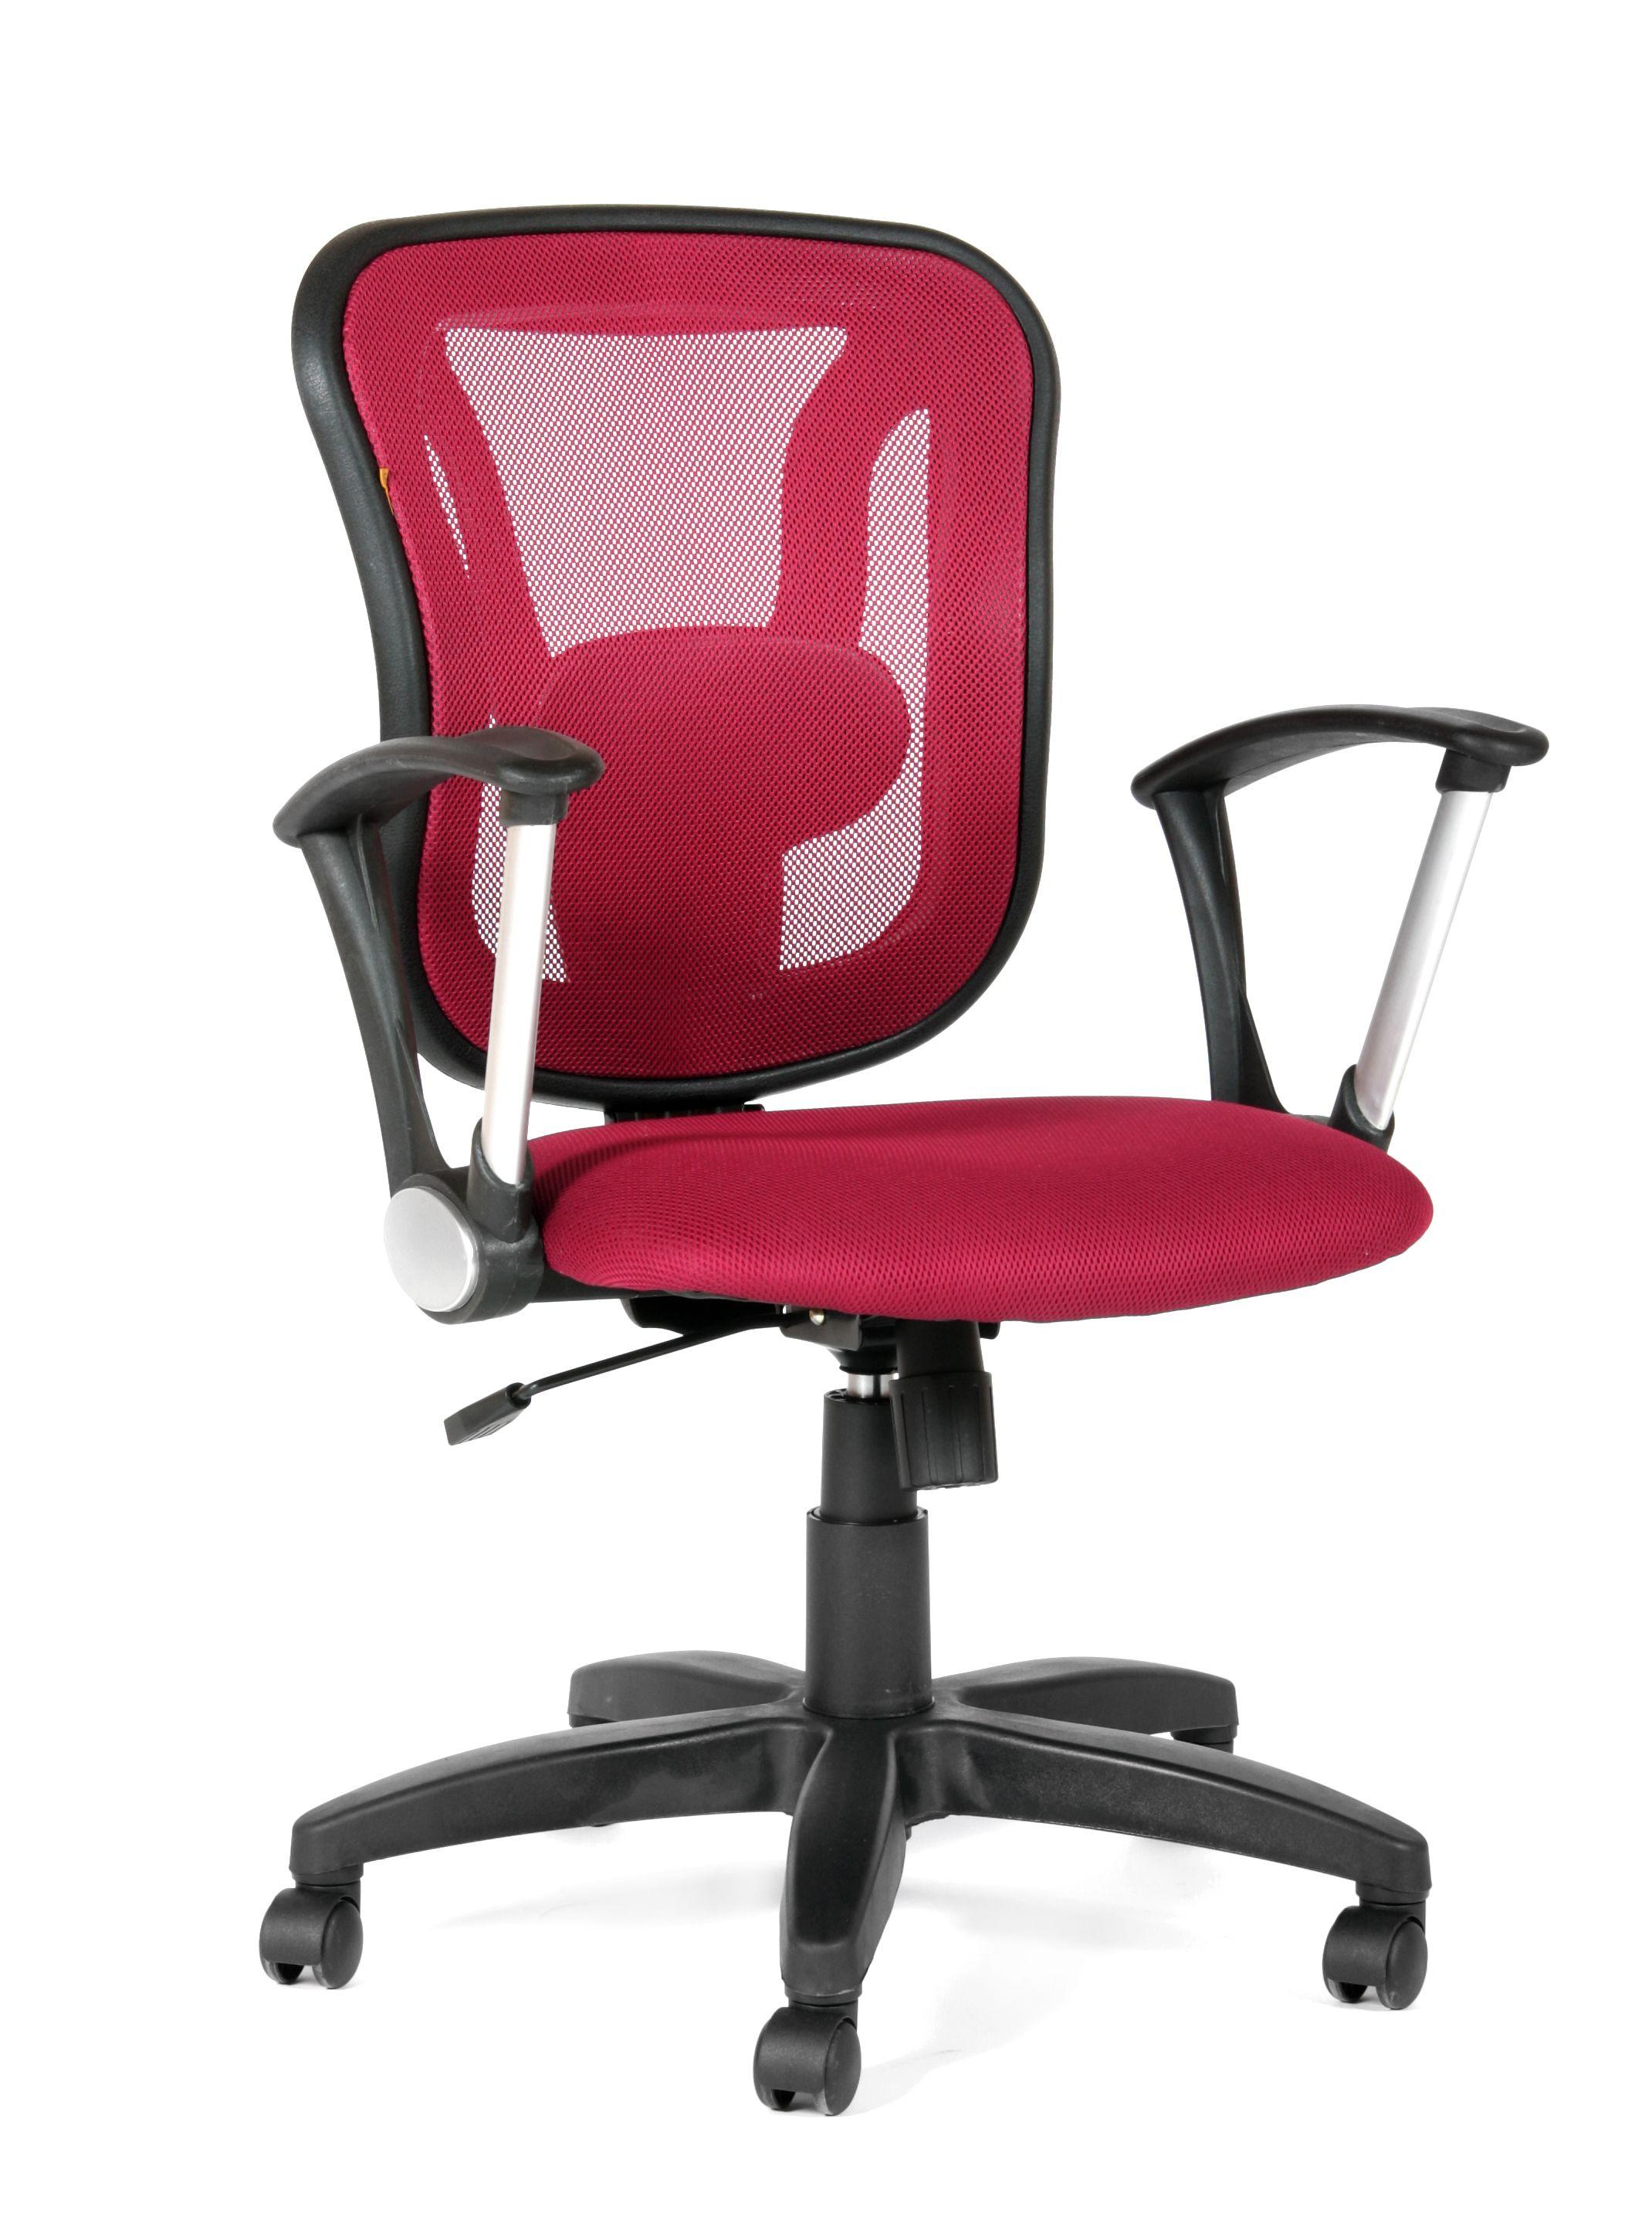 Biuro kėdė RENO 452 TG